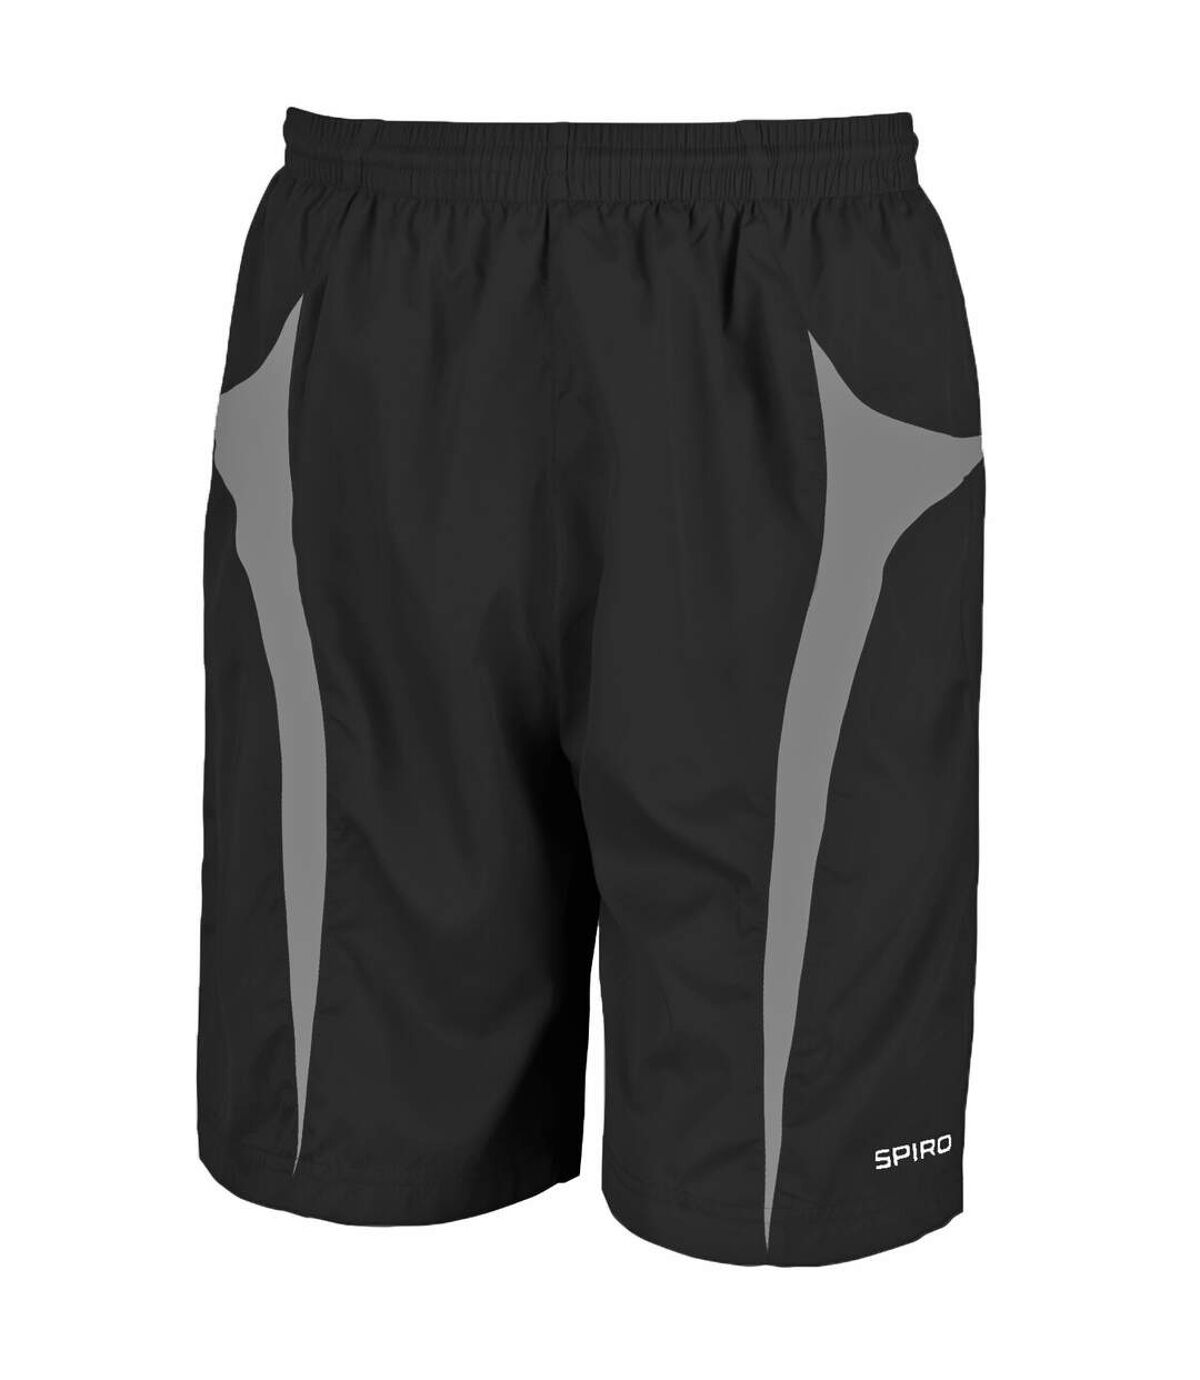 Spiro Mens Micro-Team Sports Shorts (Grey/Aqua) - UTRW1478